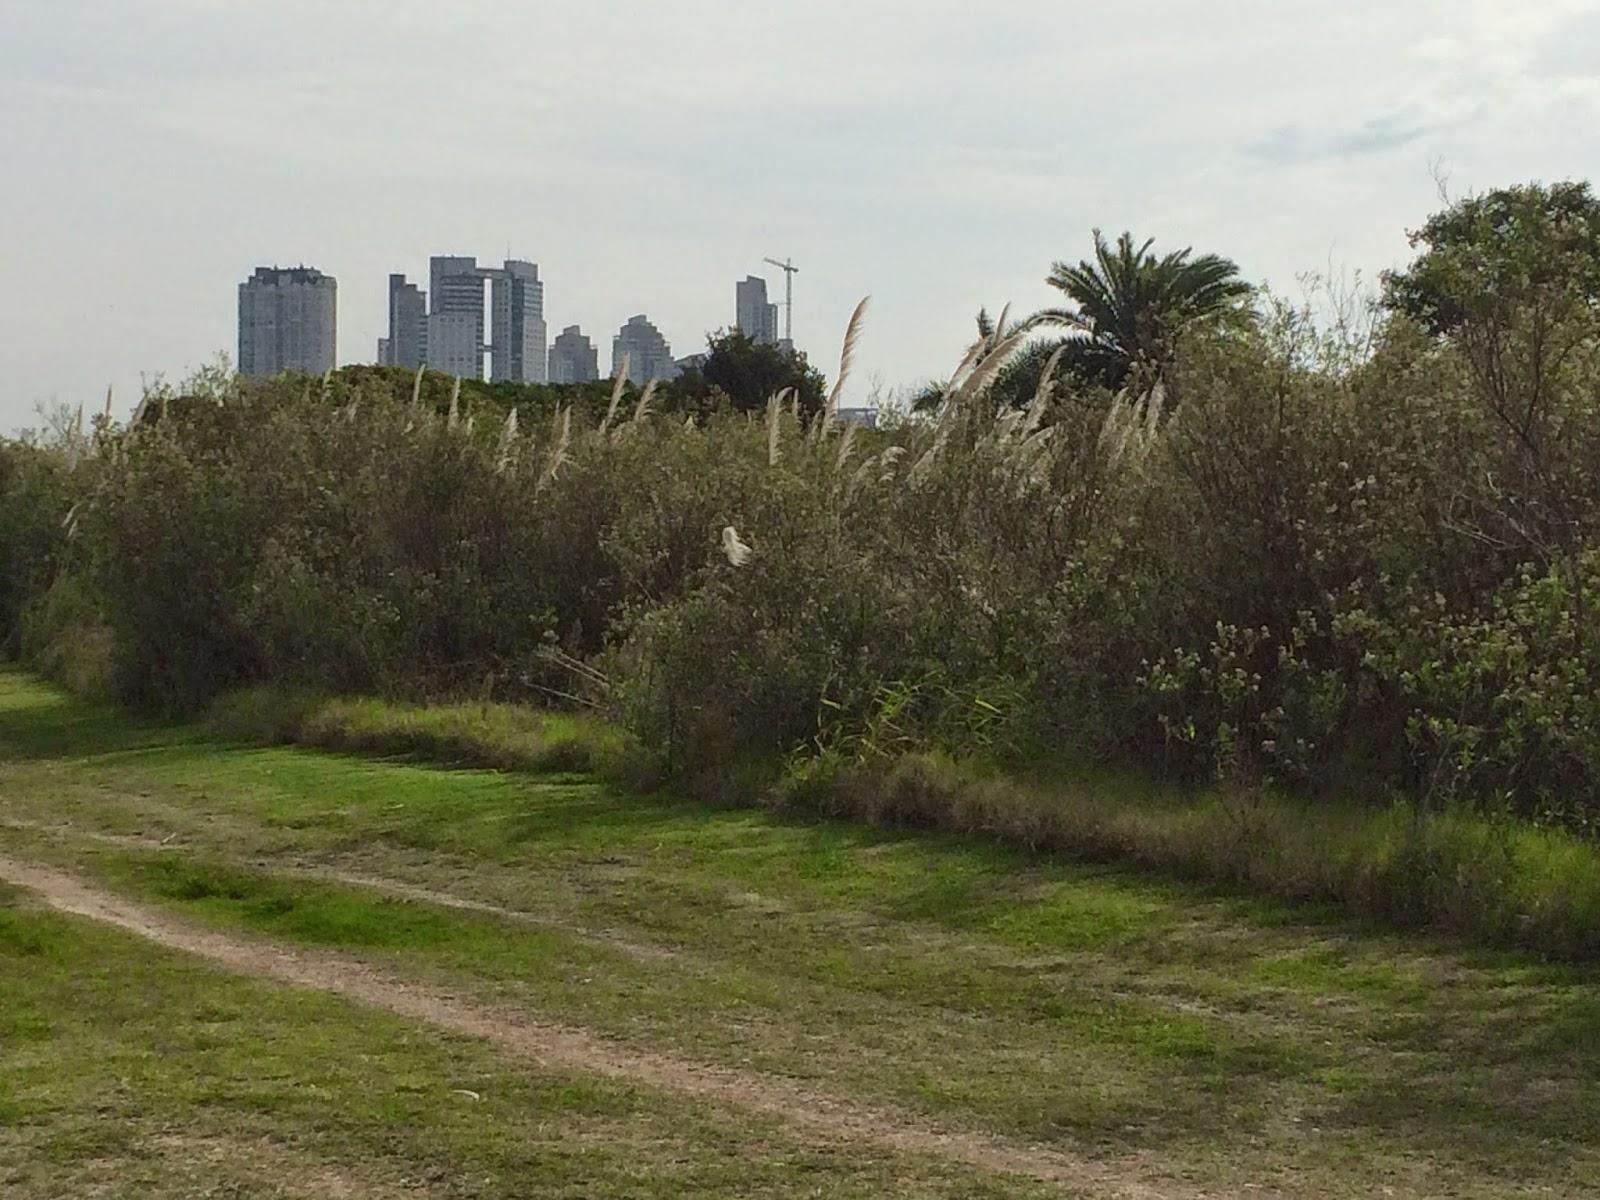 park_reserva_ecologica_argentina_9.jpg